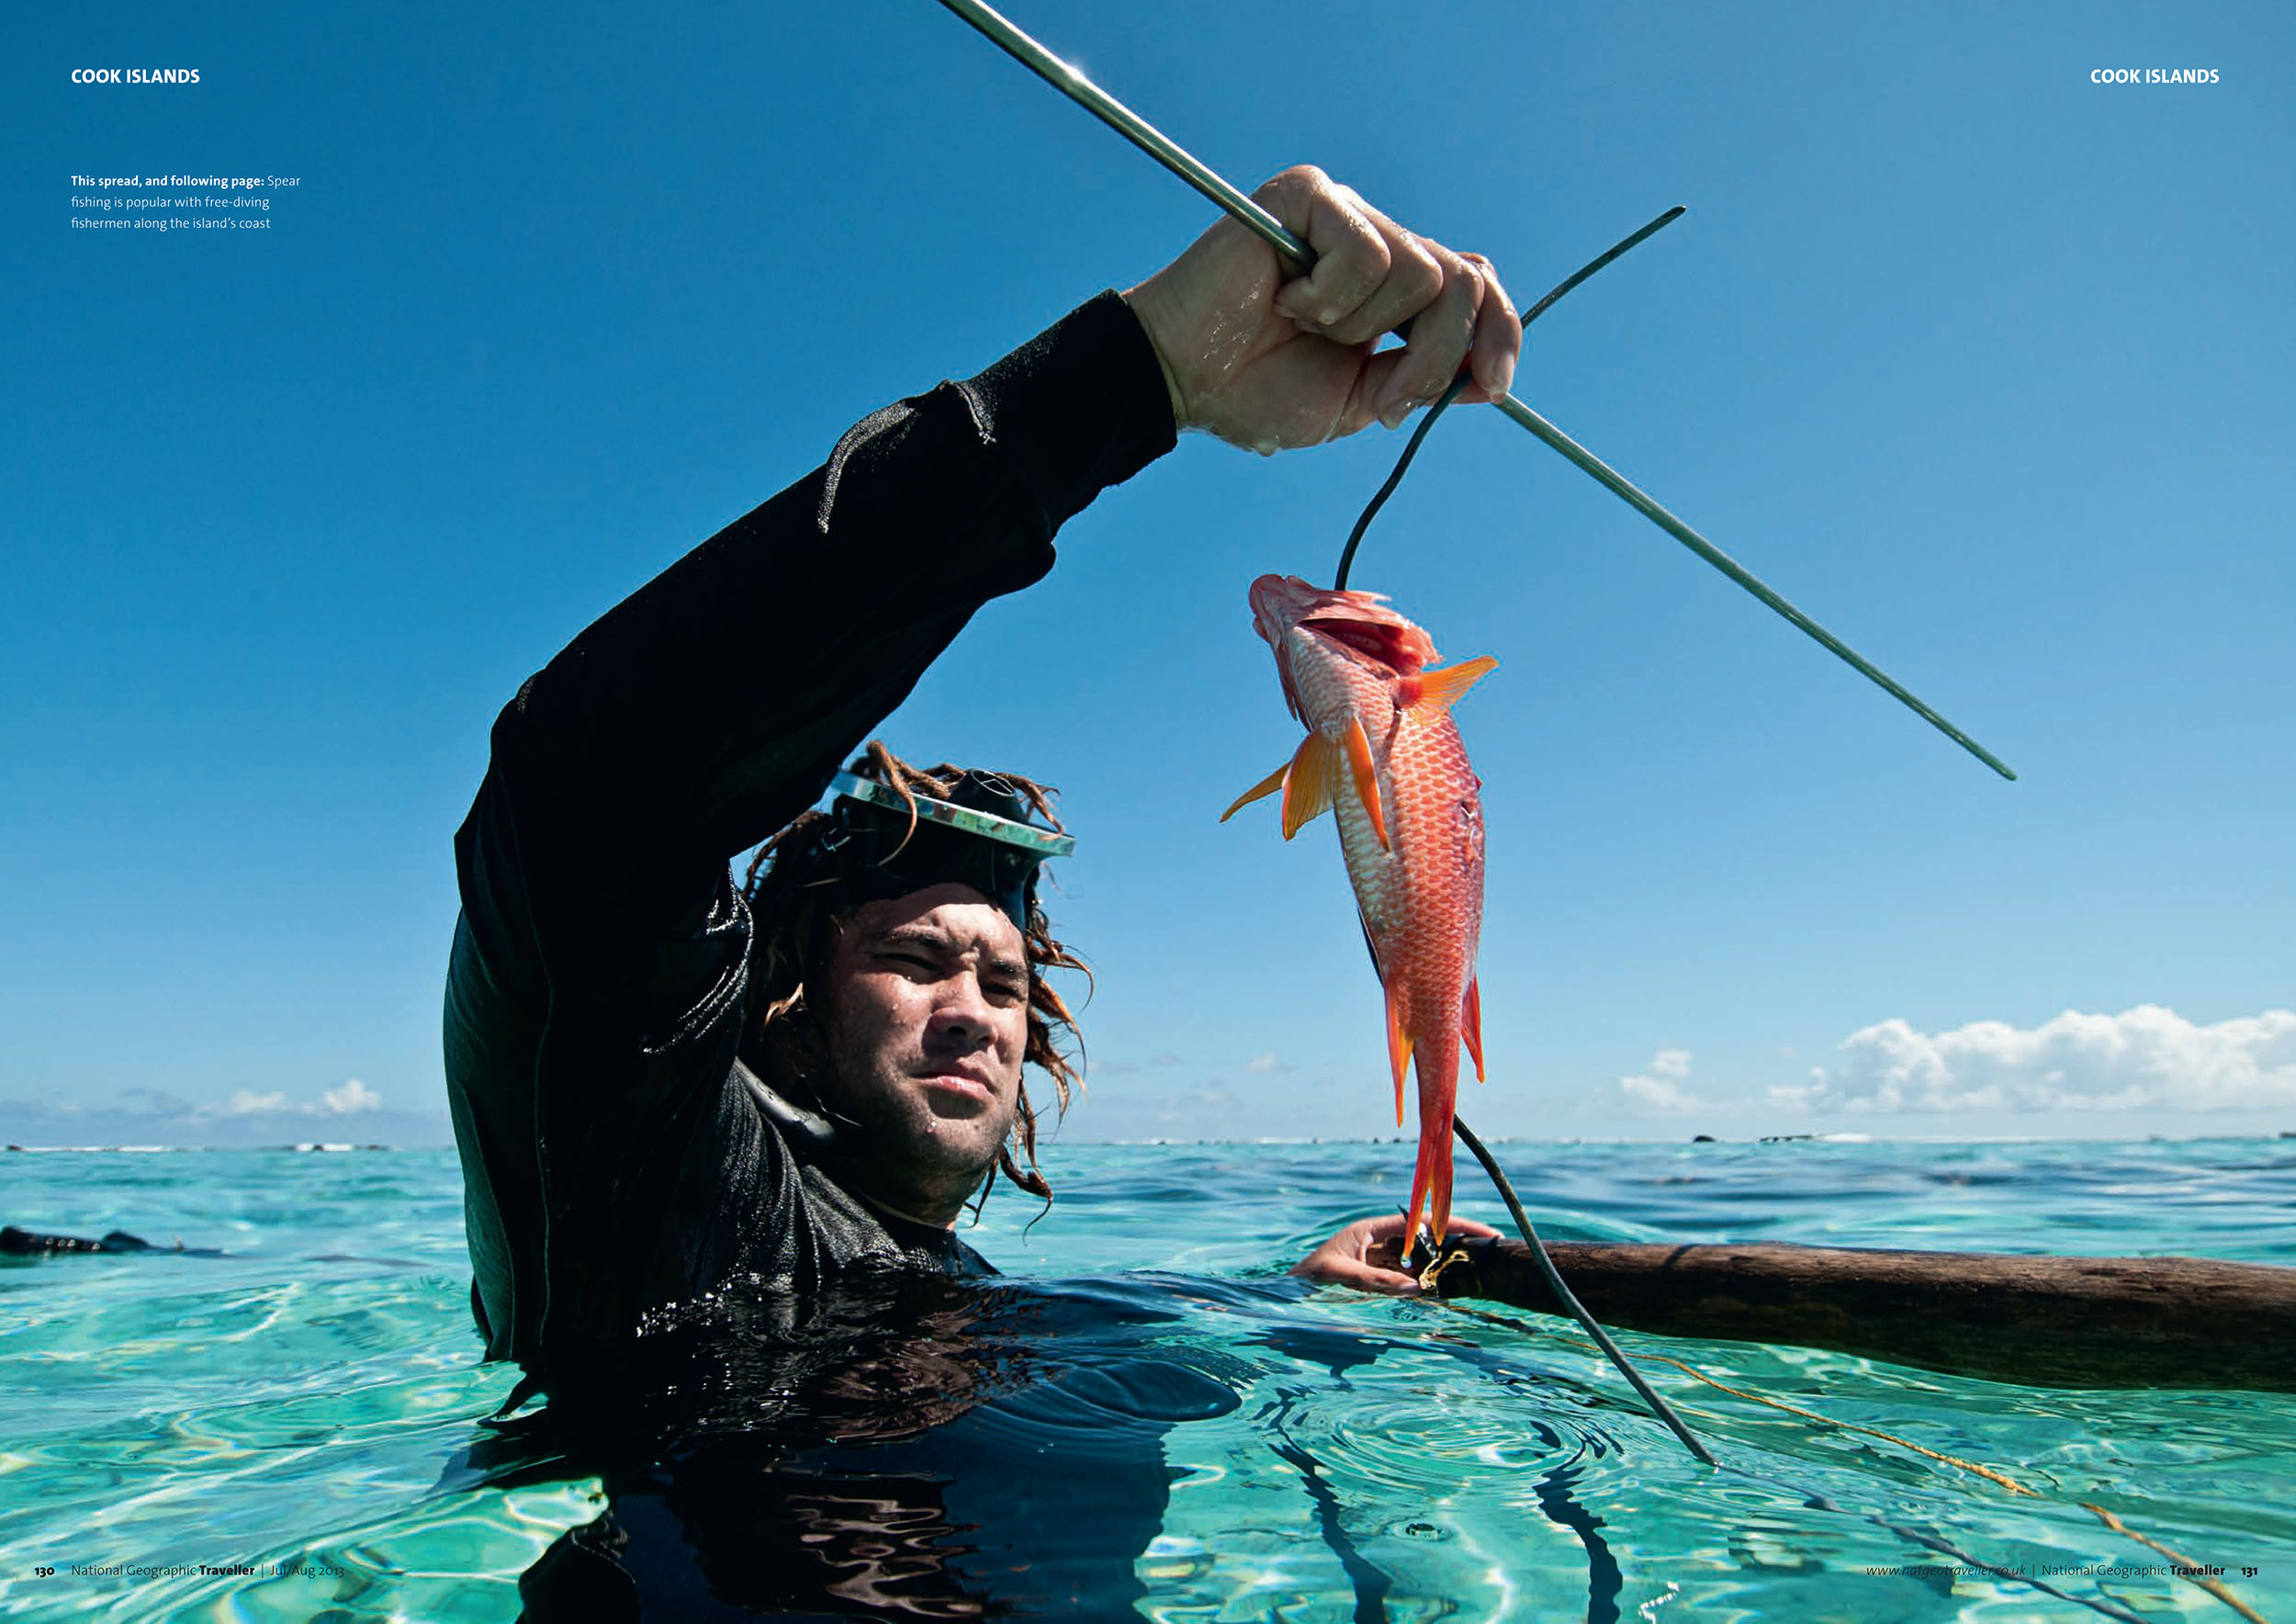 Pickard_20130701_National_Geographic_Traveller_Aitutaki_Island_004.jpg